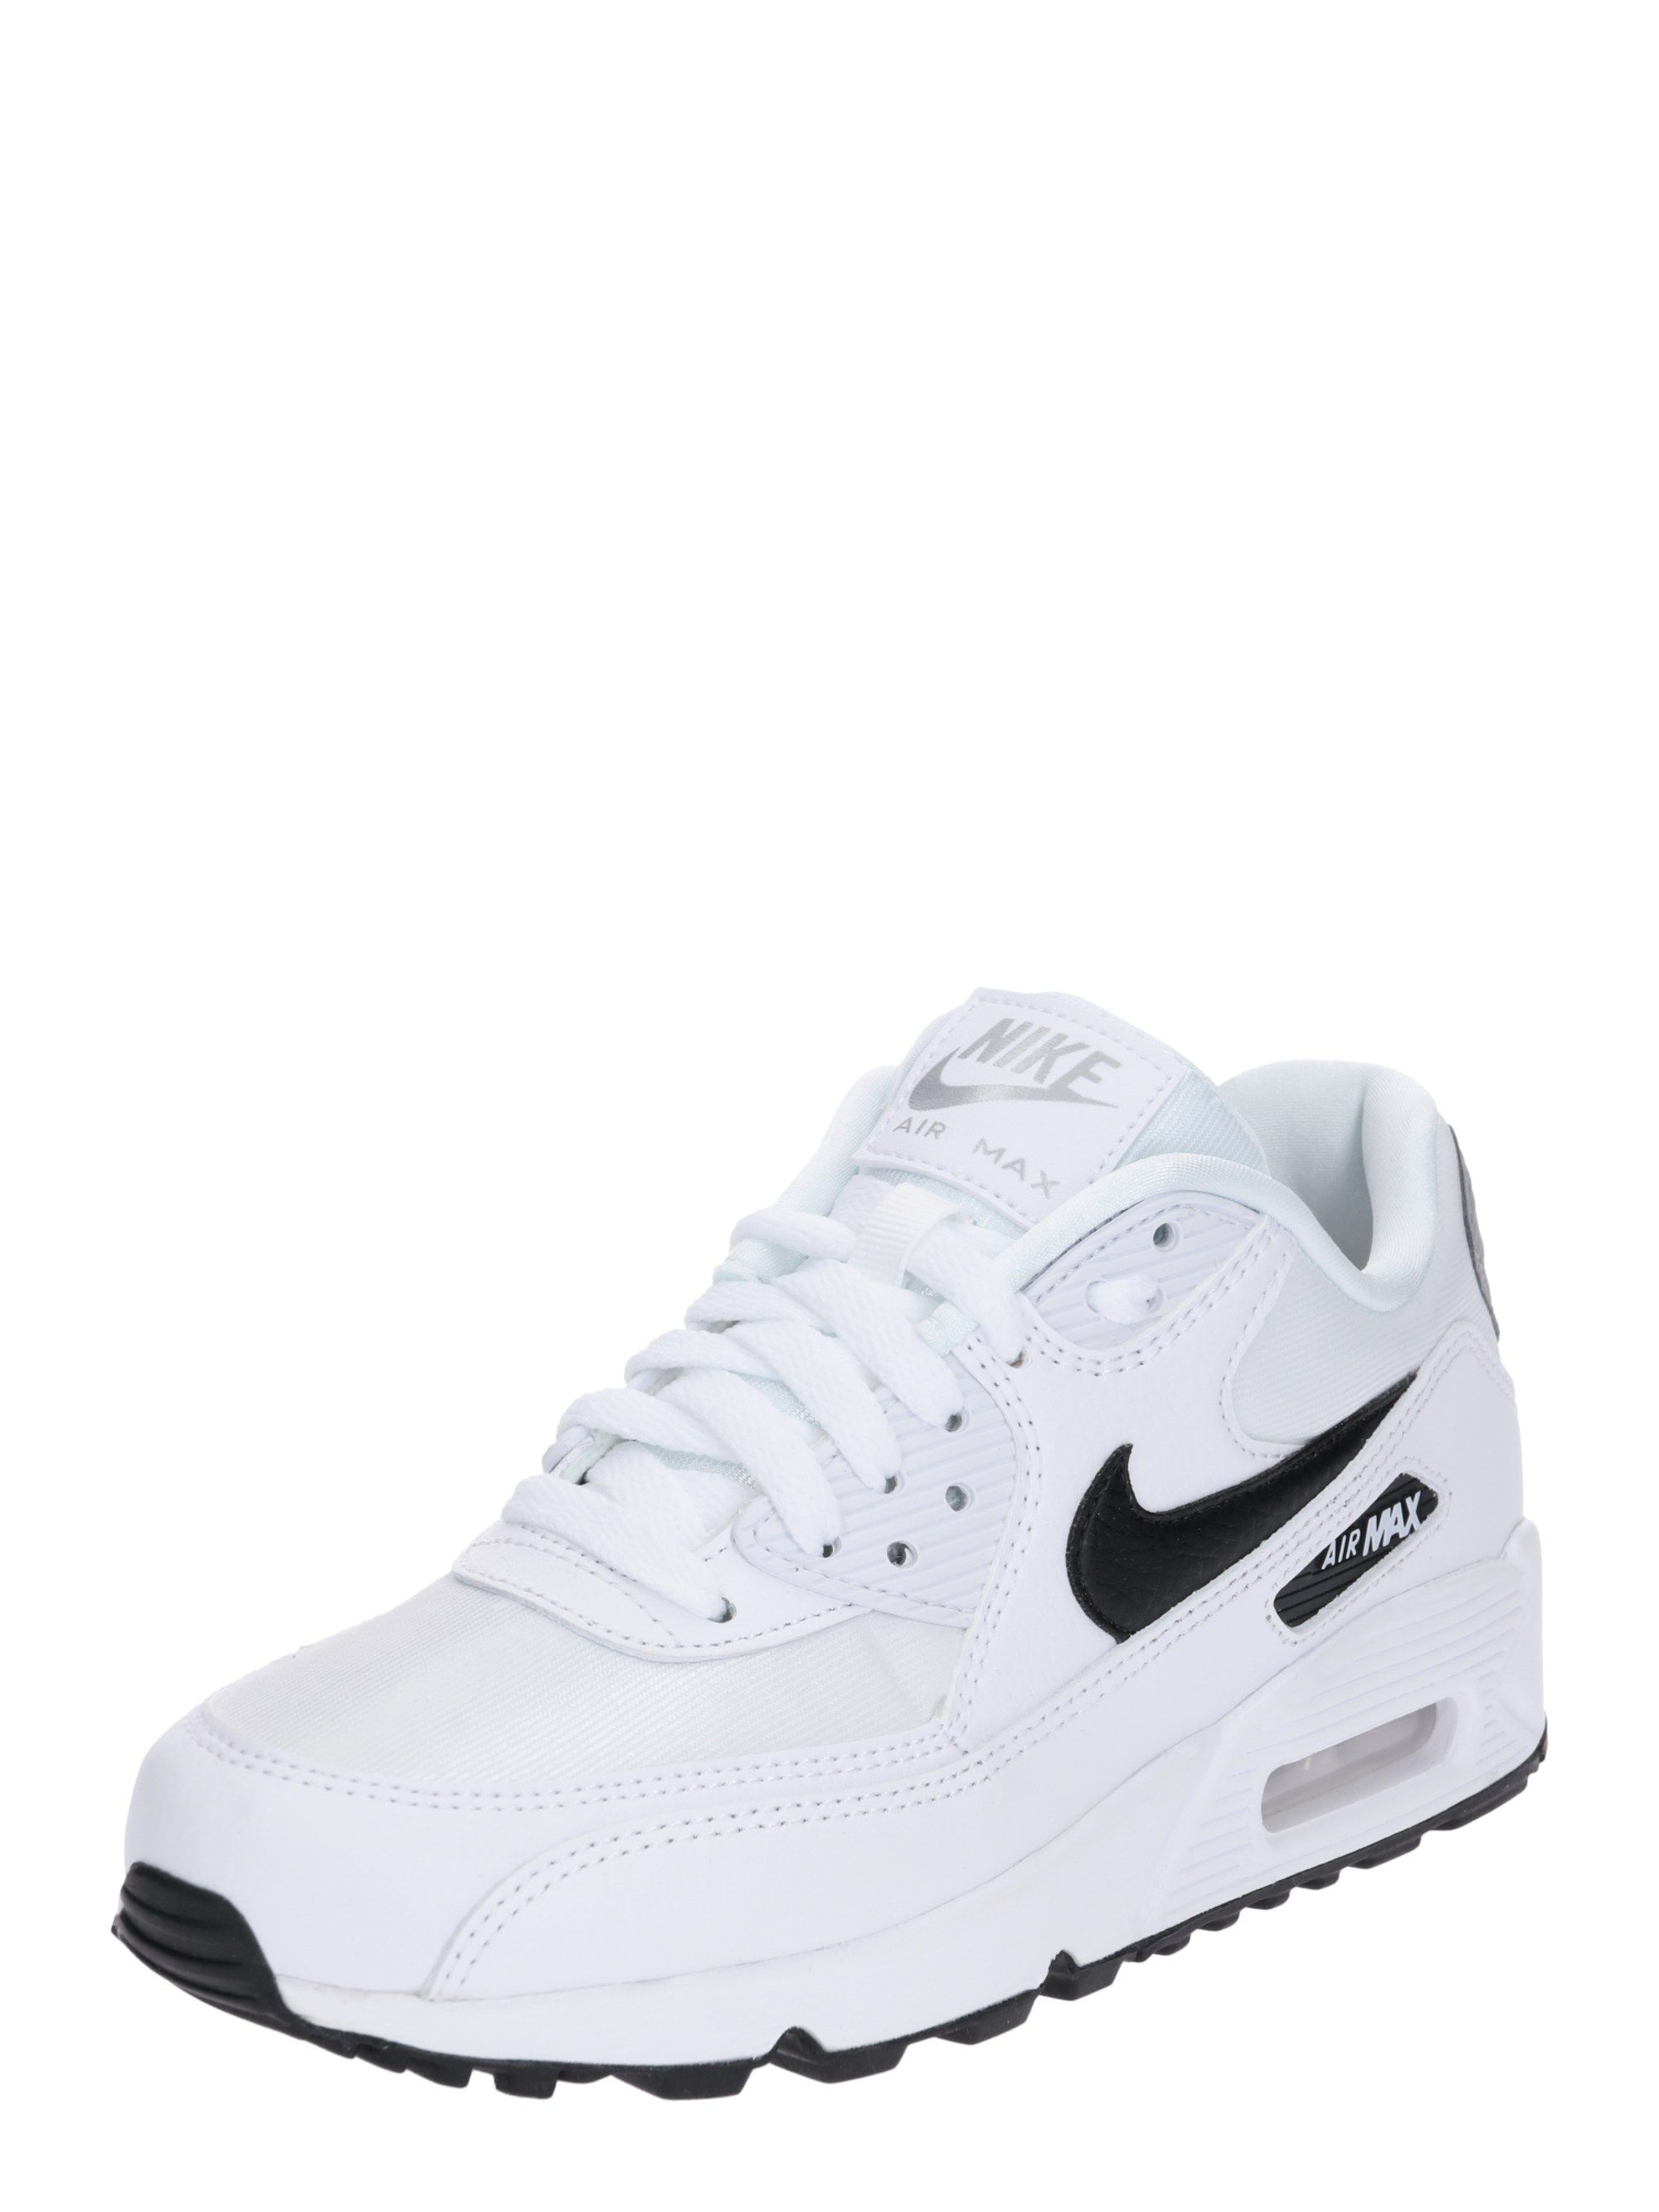 Damen Nike Sportswear Sneaker Air Max 90 Braun Schwarz Weiss Kategorie Damen Schuhesneakersneaker Lowsneaker Mat Air Max Sneakers Nike Sportswear Sneakers